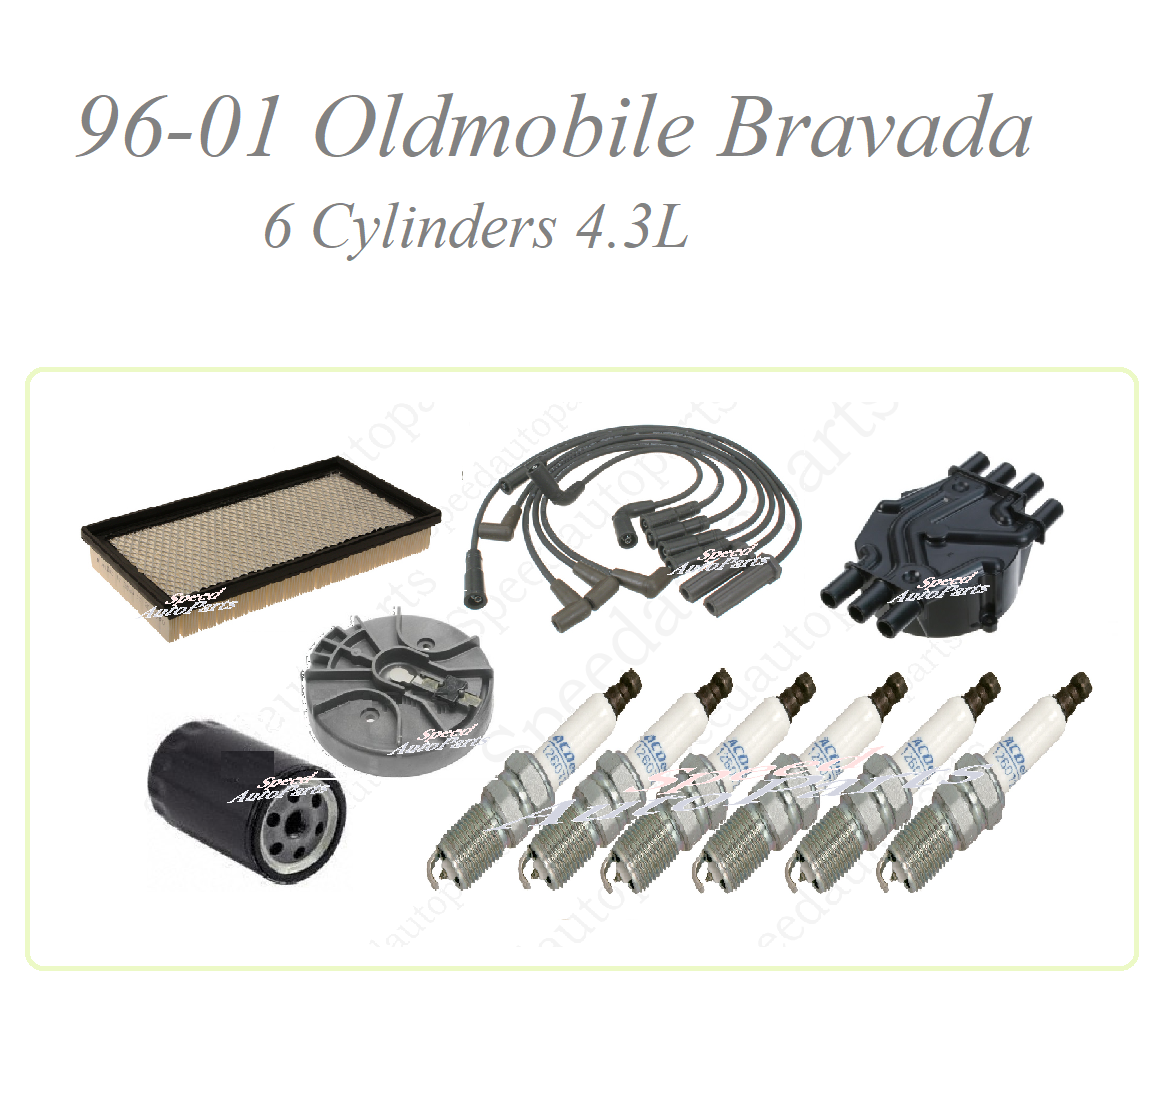 Tune Up For 96-01 Oldmobile Bravada 4.3V6: Spark Plug Wire set Cap ...